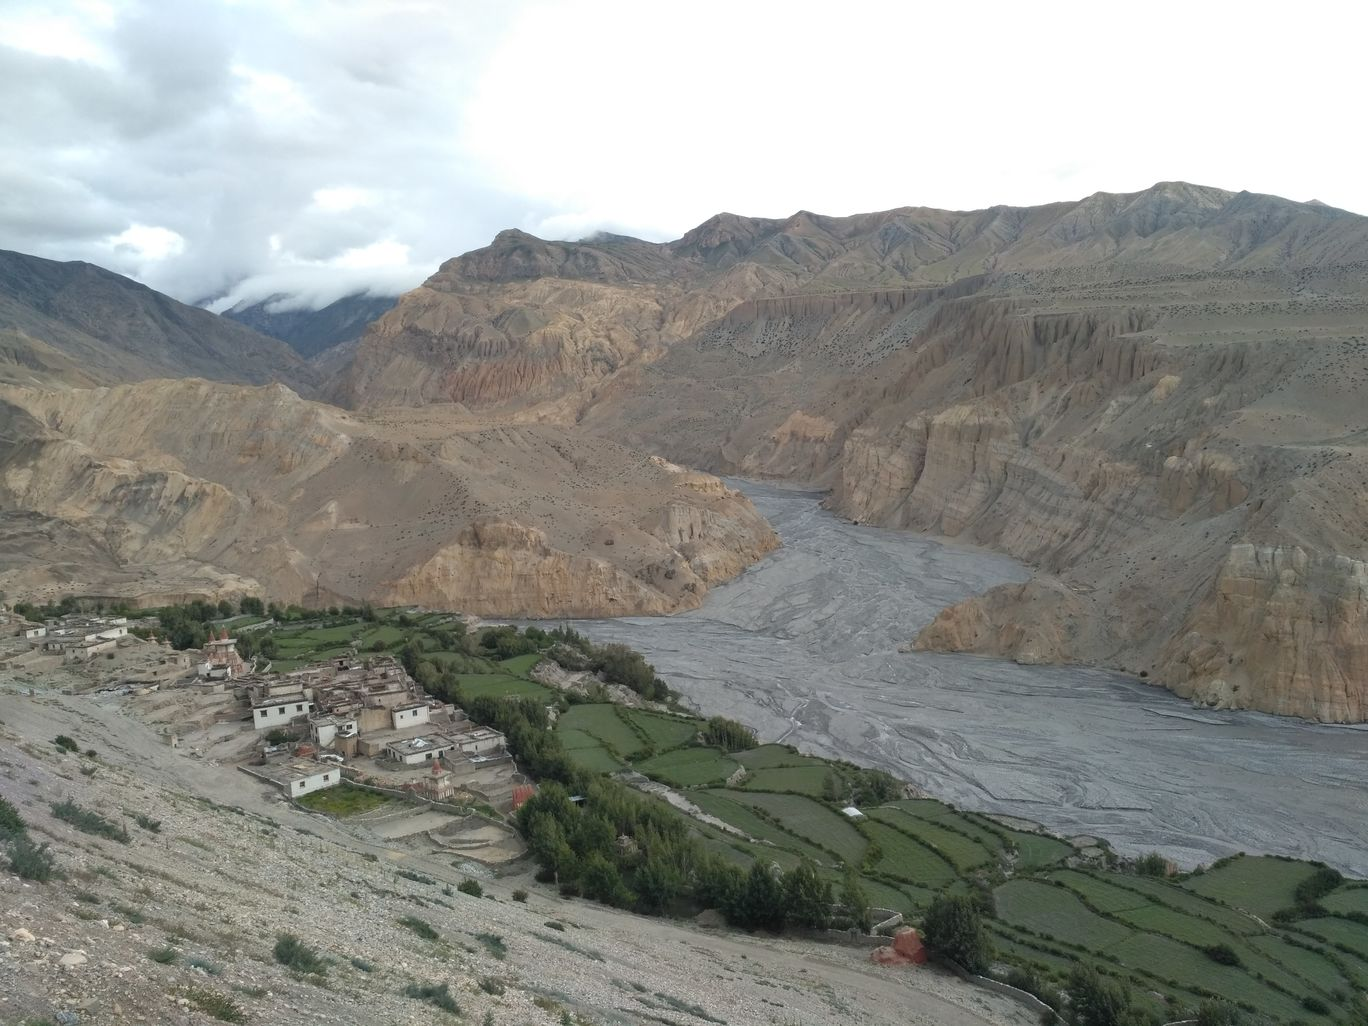 Photo of Lo Manthang By Nepal Gateway Trekking